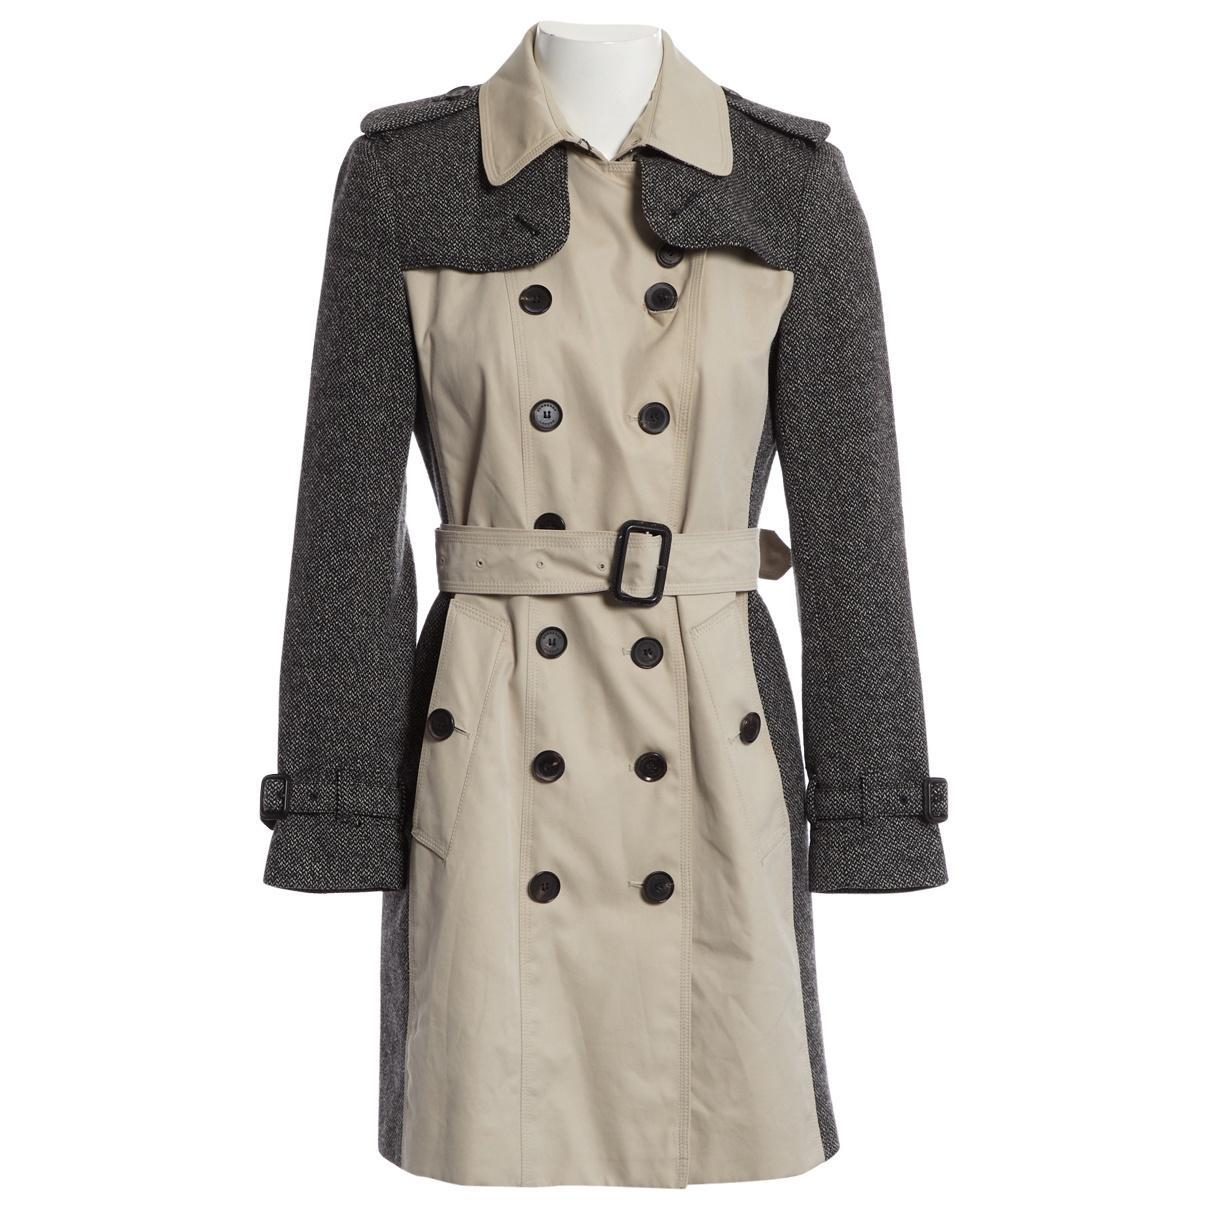 20d22d2cf9b4 Lyst - Burberry Trench Coat